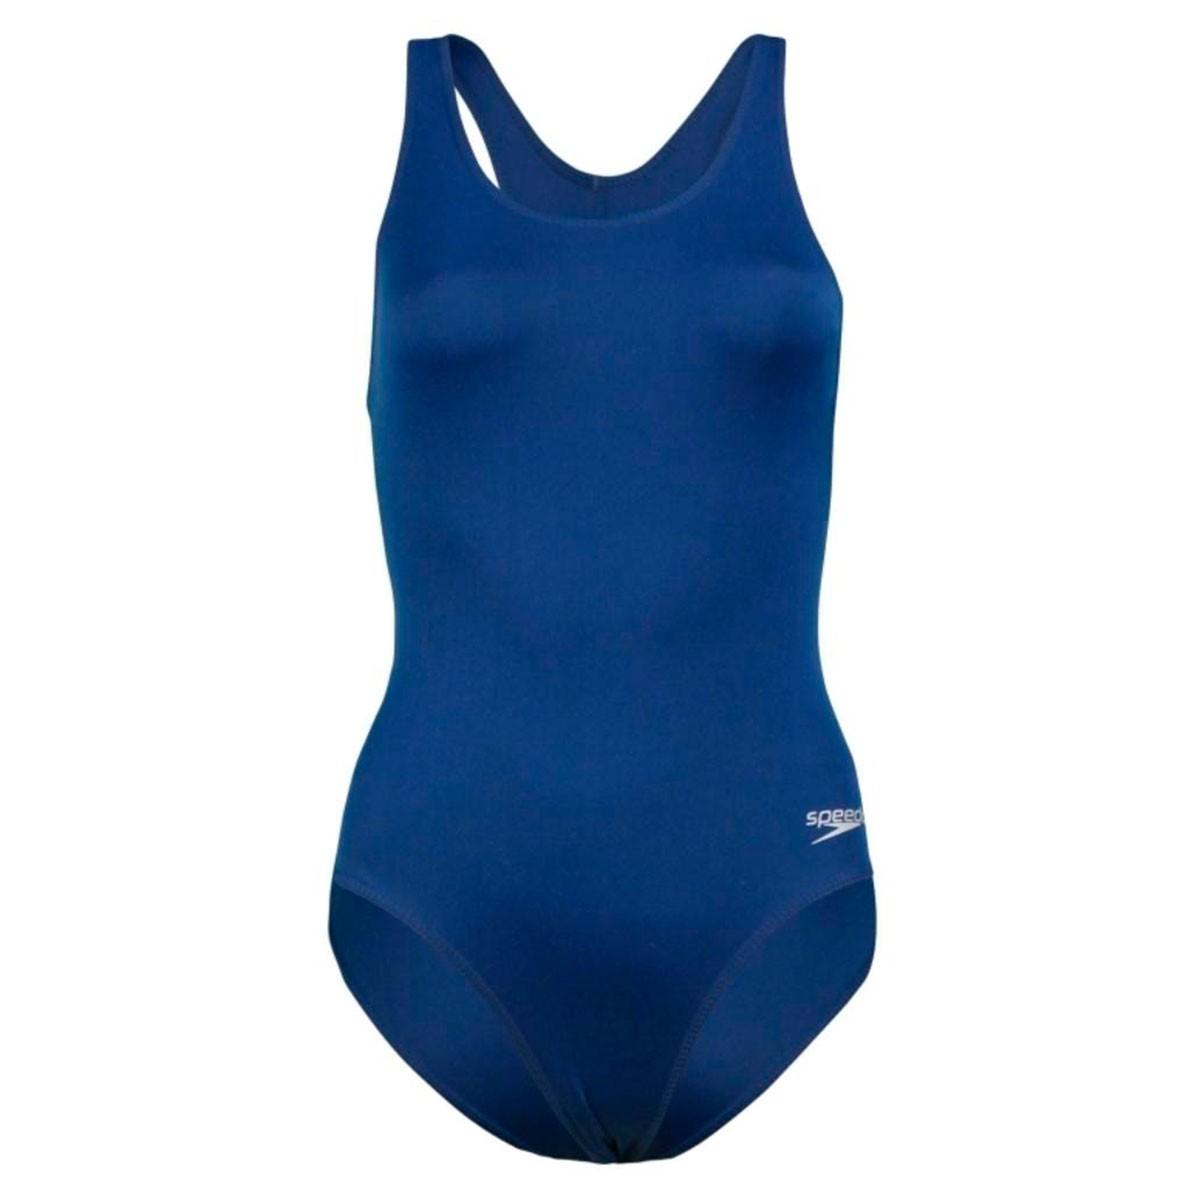 Maiô Speedo Hydrofast Plus Feminino Azul Marinho